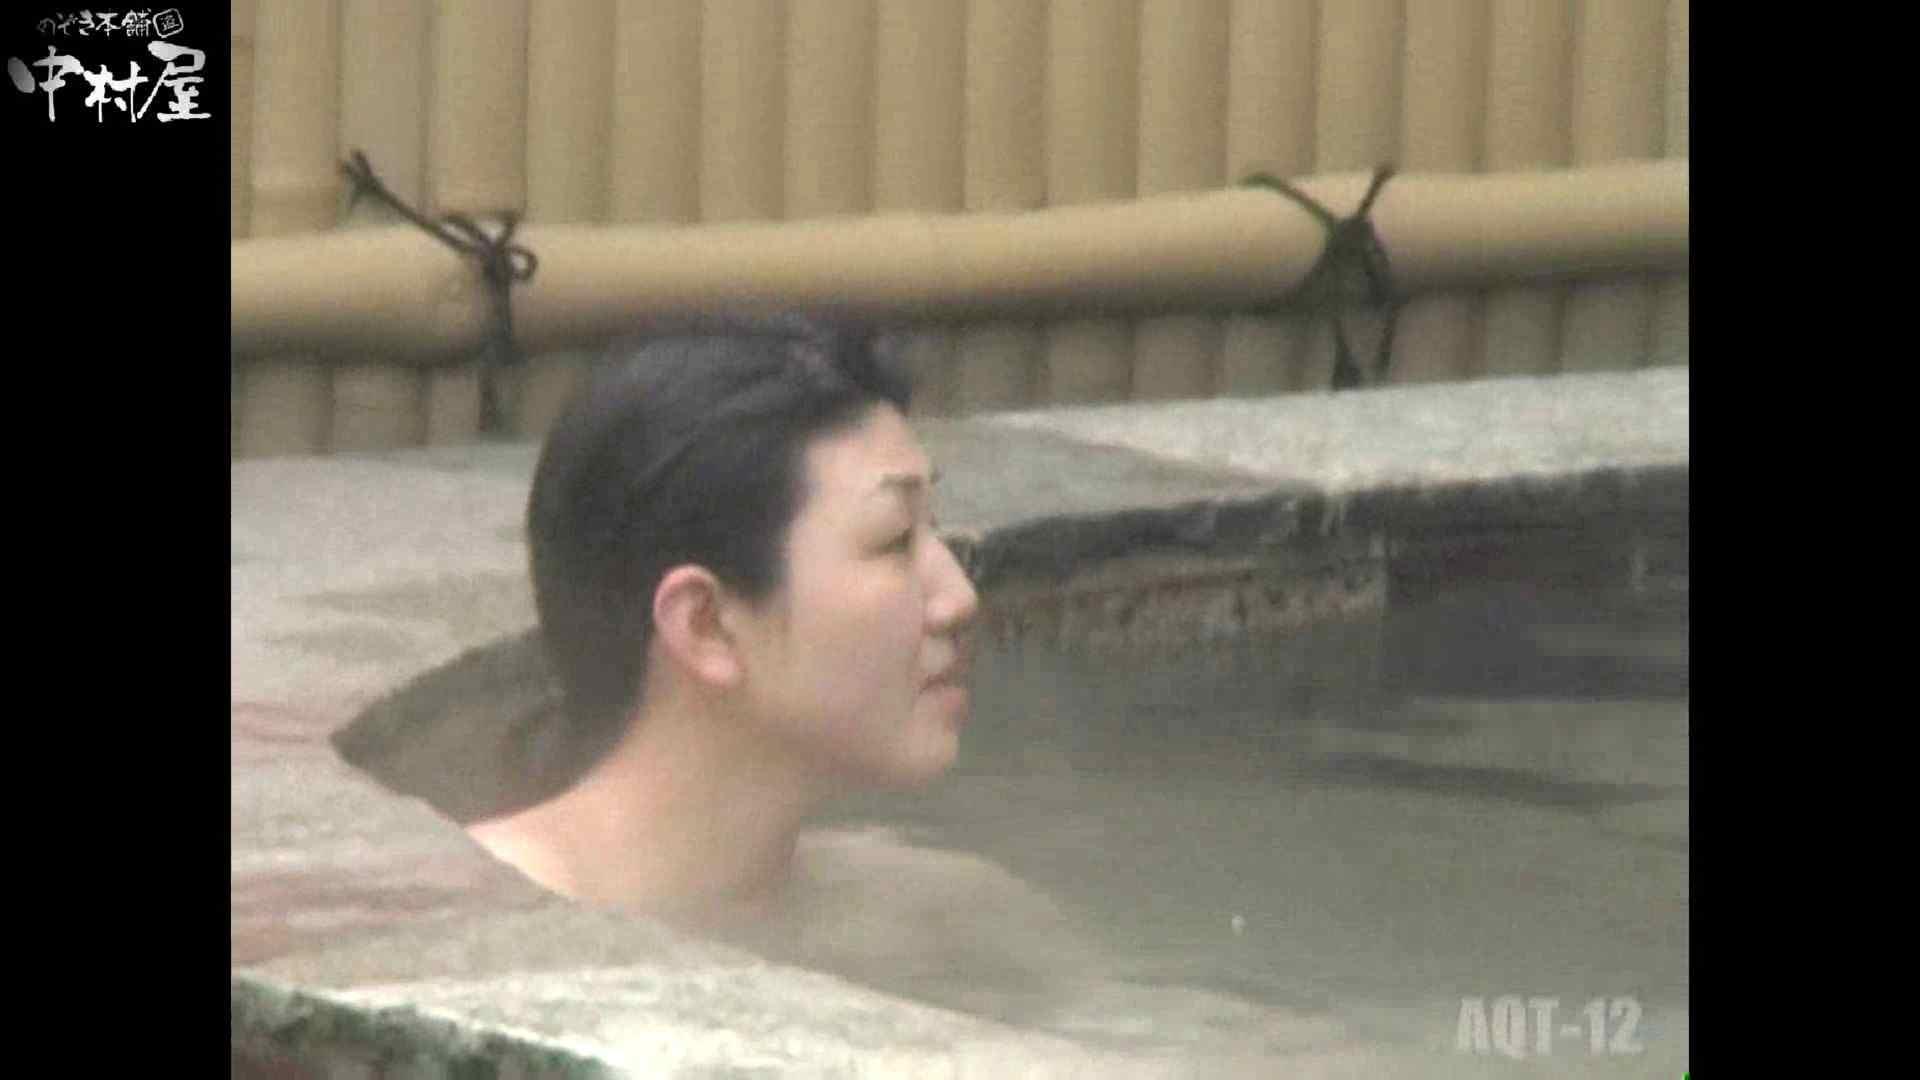 Aquaな露天風呂Vol.876潜入盗撮露天風呂十二判湯 其の六 美しいOLの裸体 AV無料動画キャプチャ 107pic 66